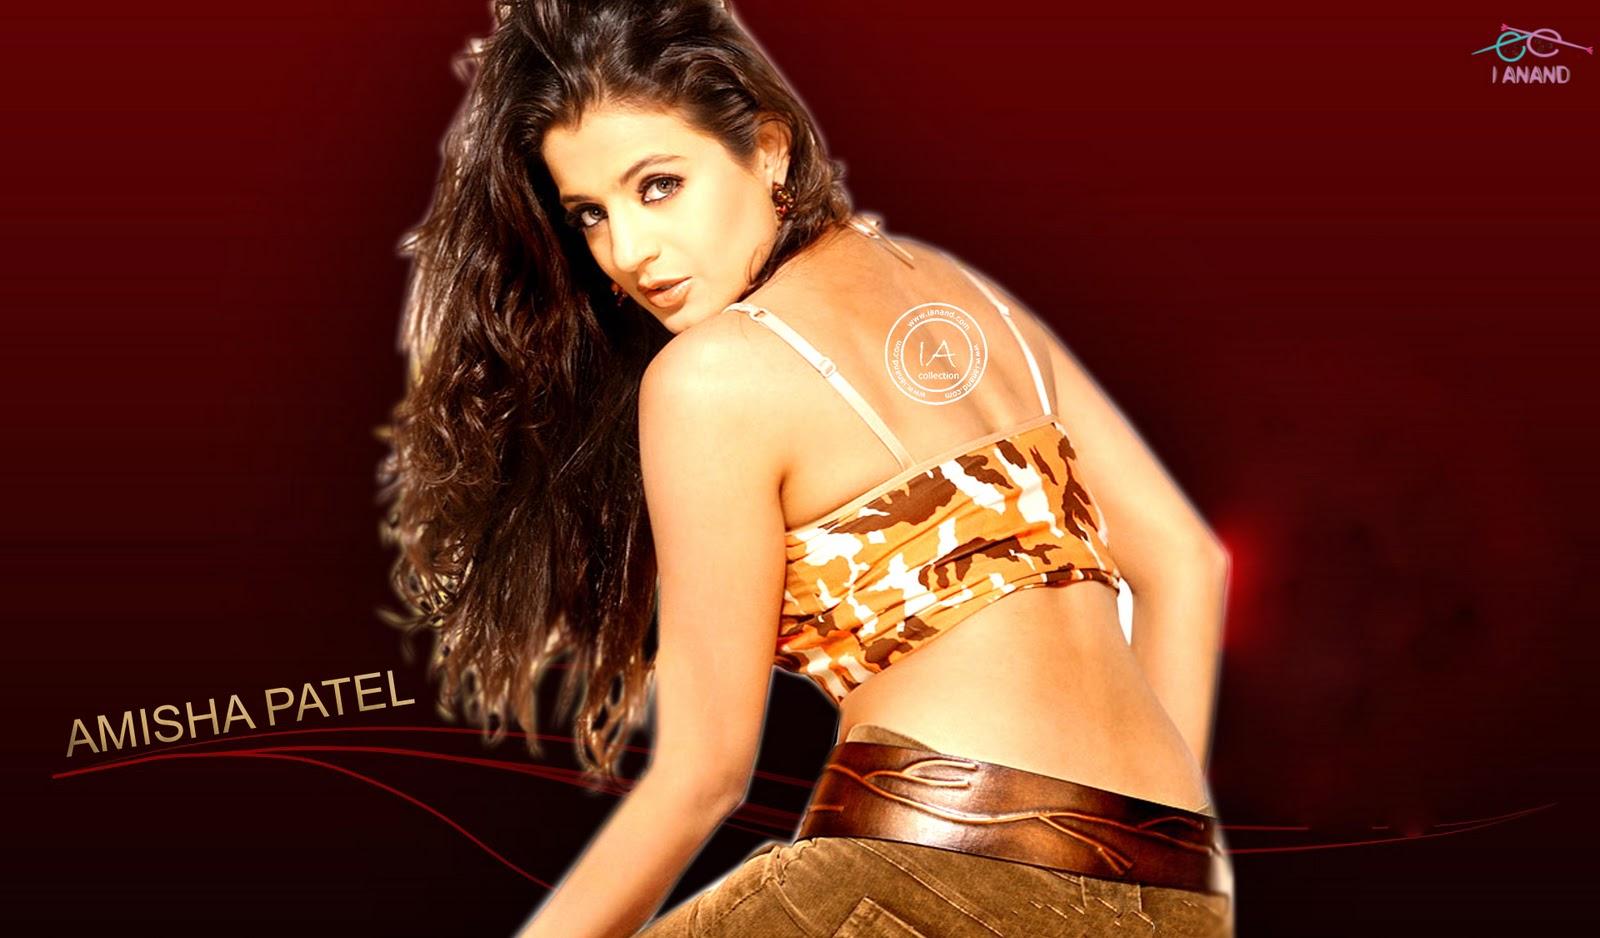 amisha patel sexy hot jpg 853x1280